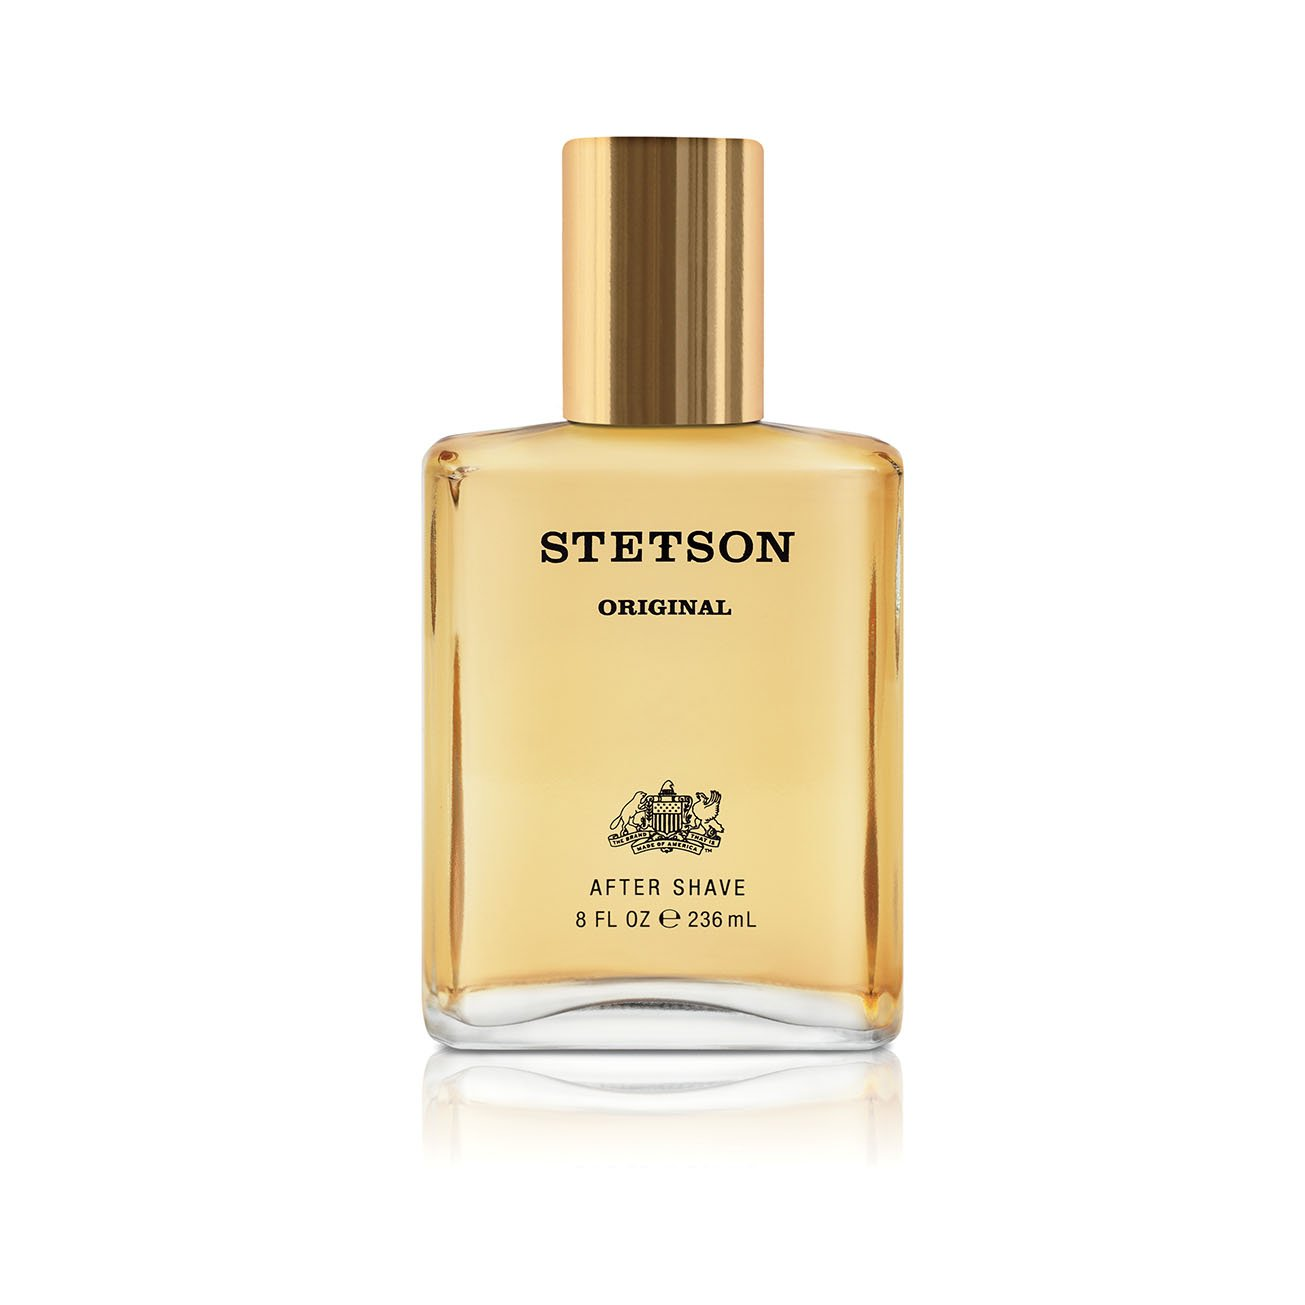 Stetson Original 8oz Aftershave WOW